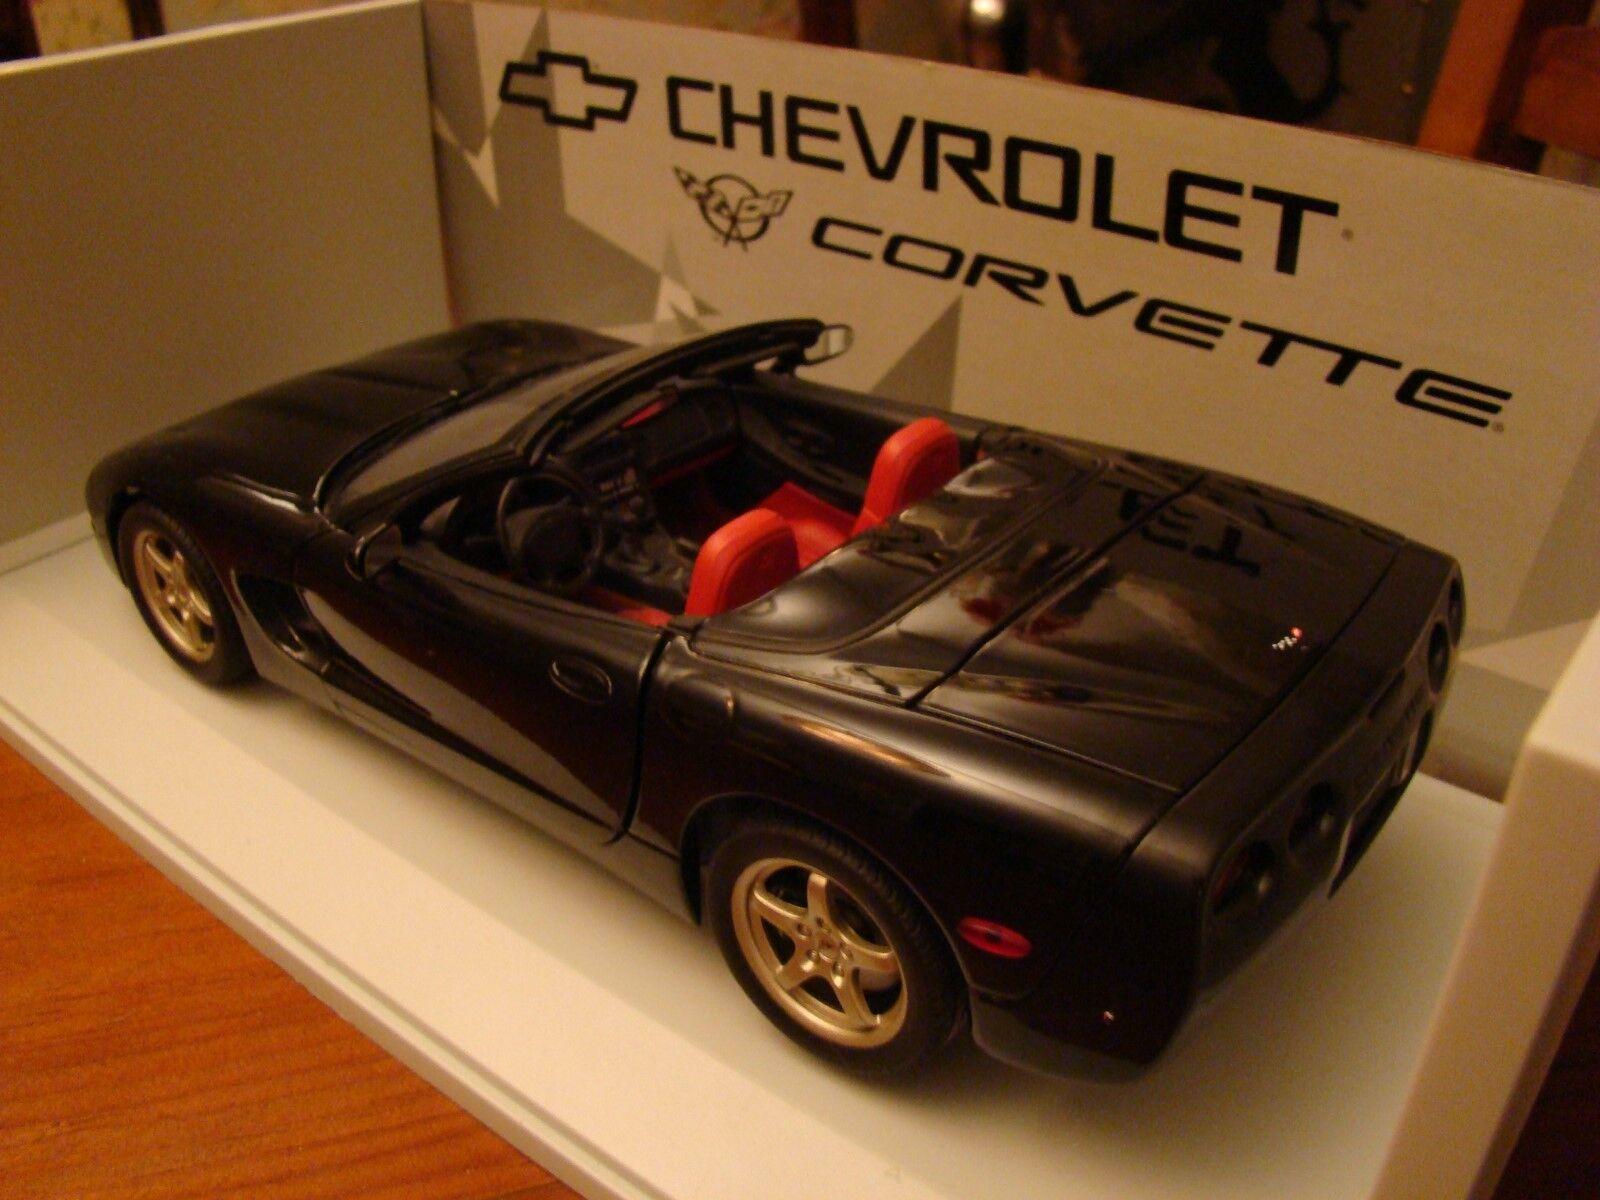 1/18 Chevrolet Corvette C5 V8 Roadster Eclipse Nero Rosso Rosso Rosso Nascondi RARA UT 1998 8b027a